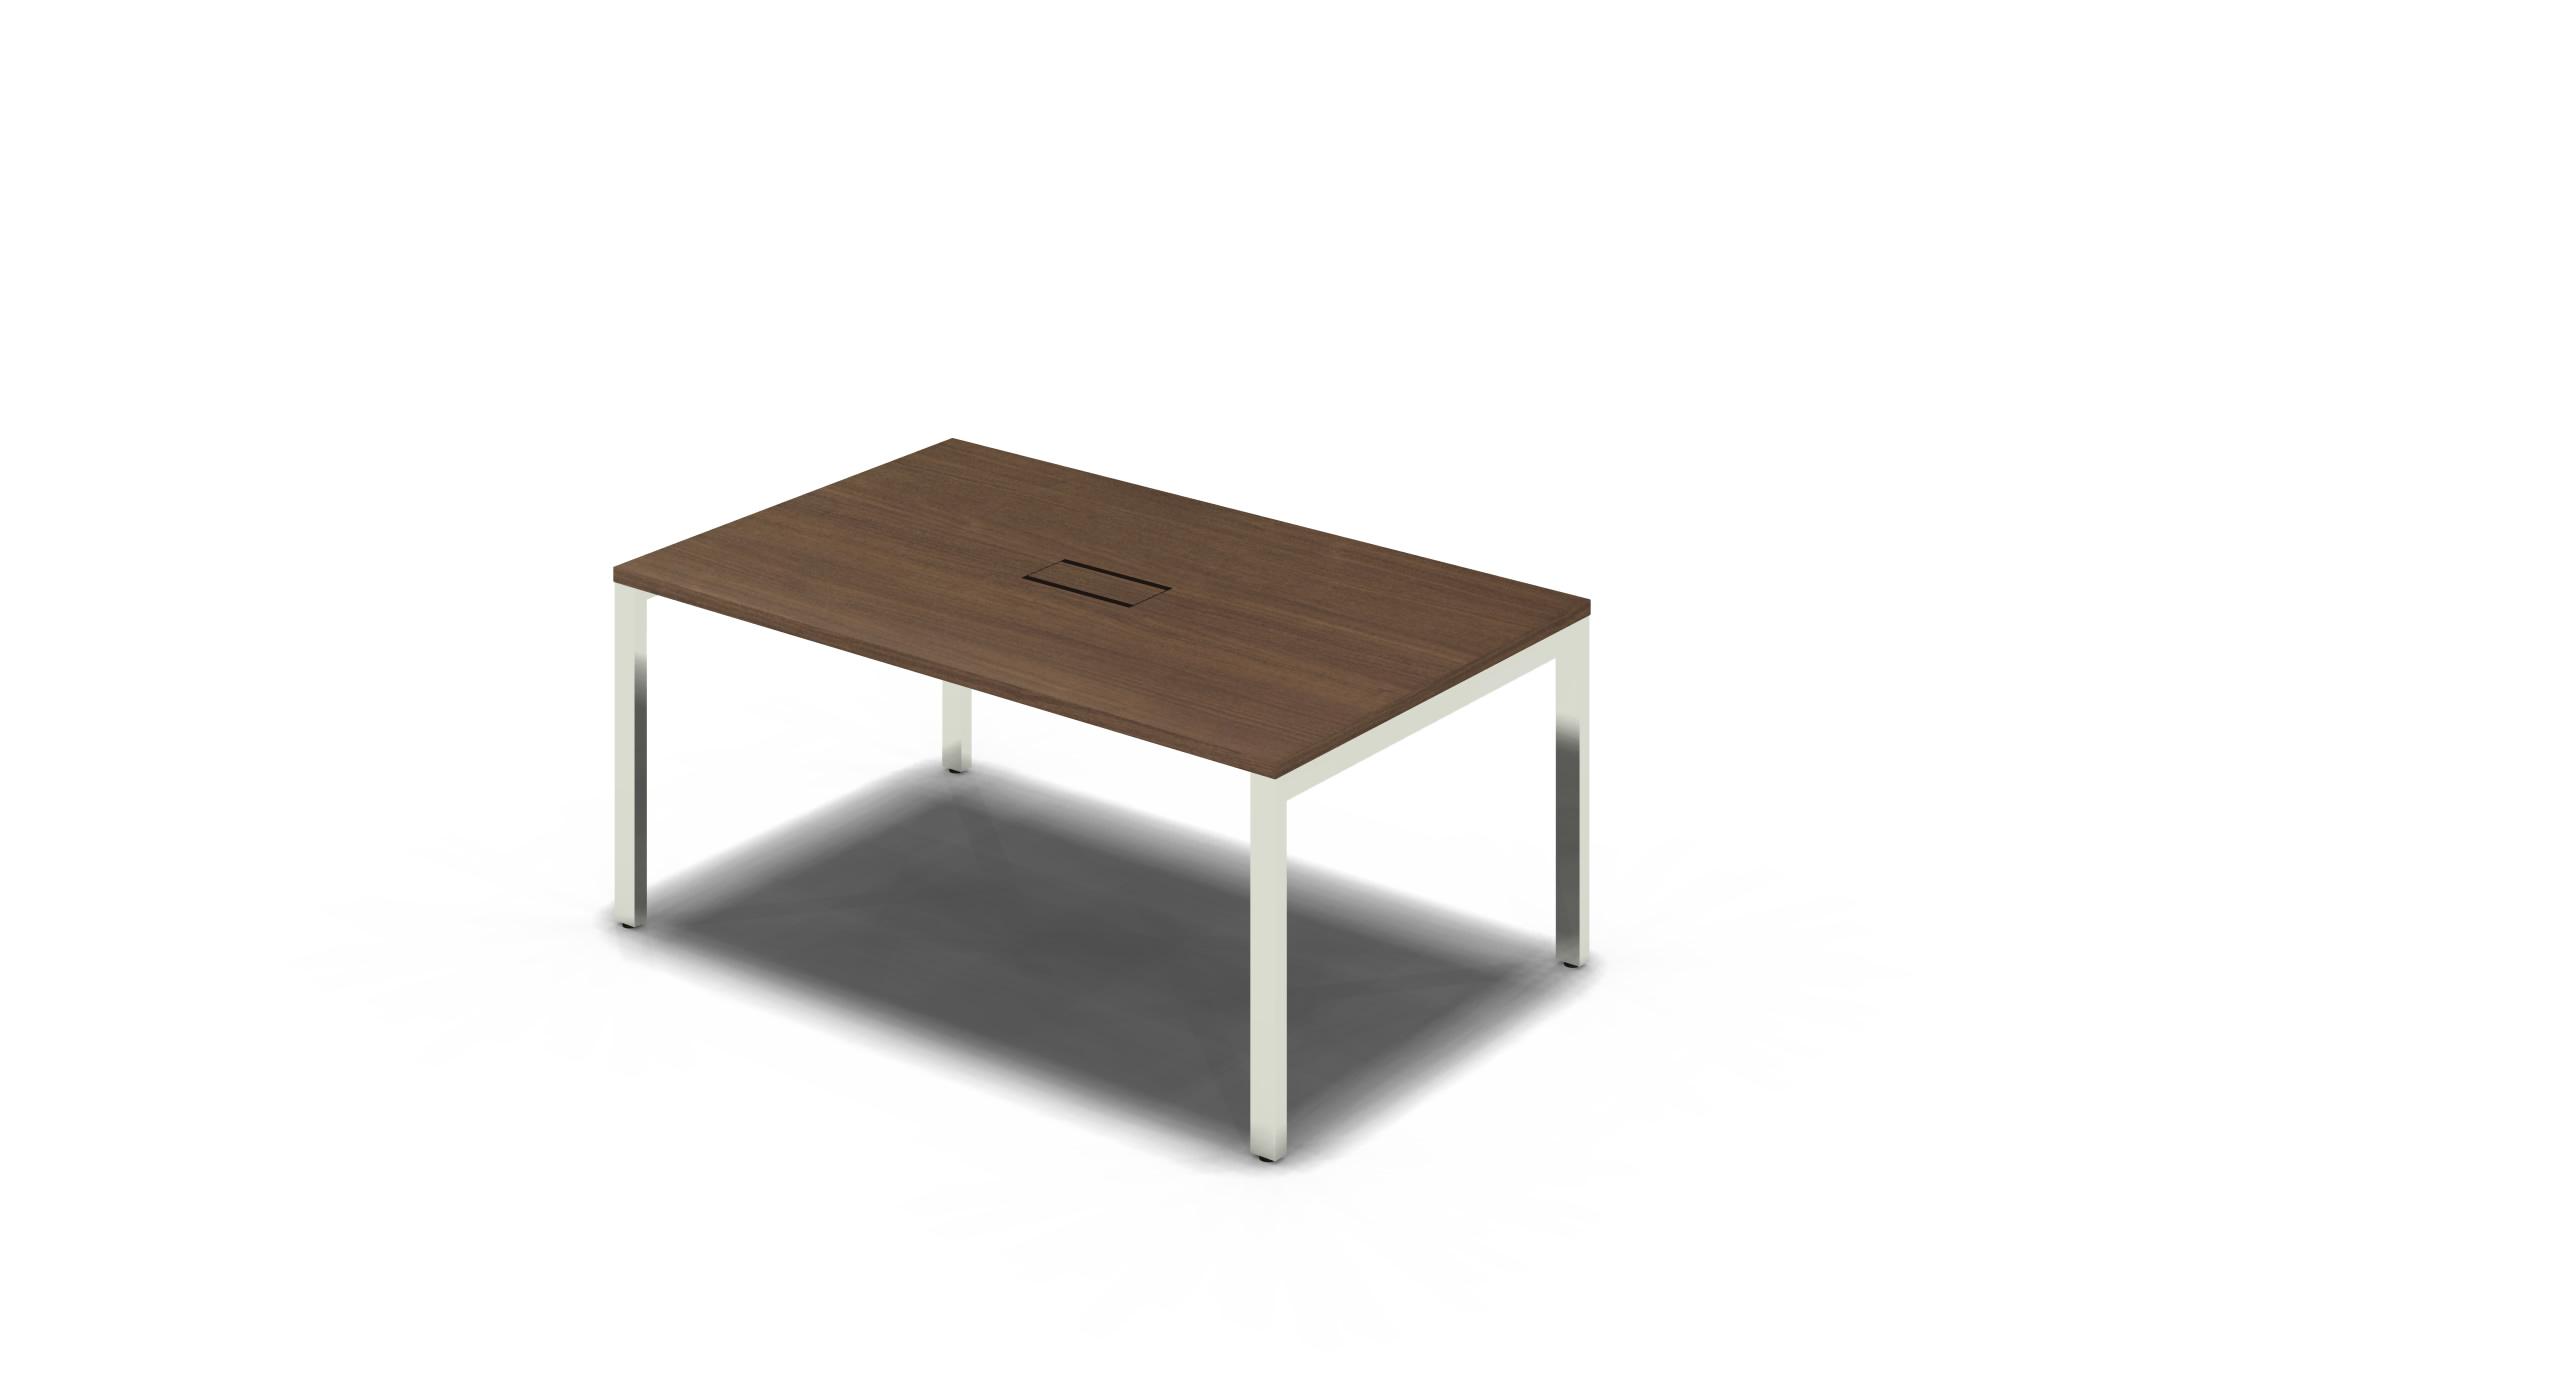 Table_Square_1500x900_Chrome_Walnut_withOption